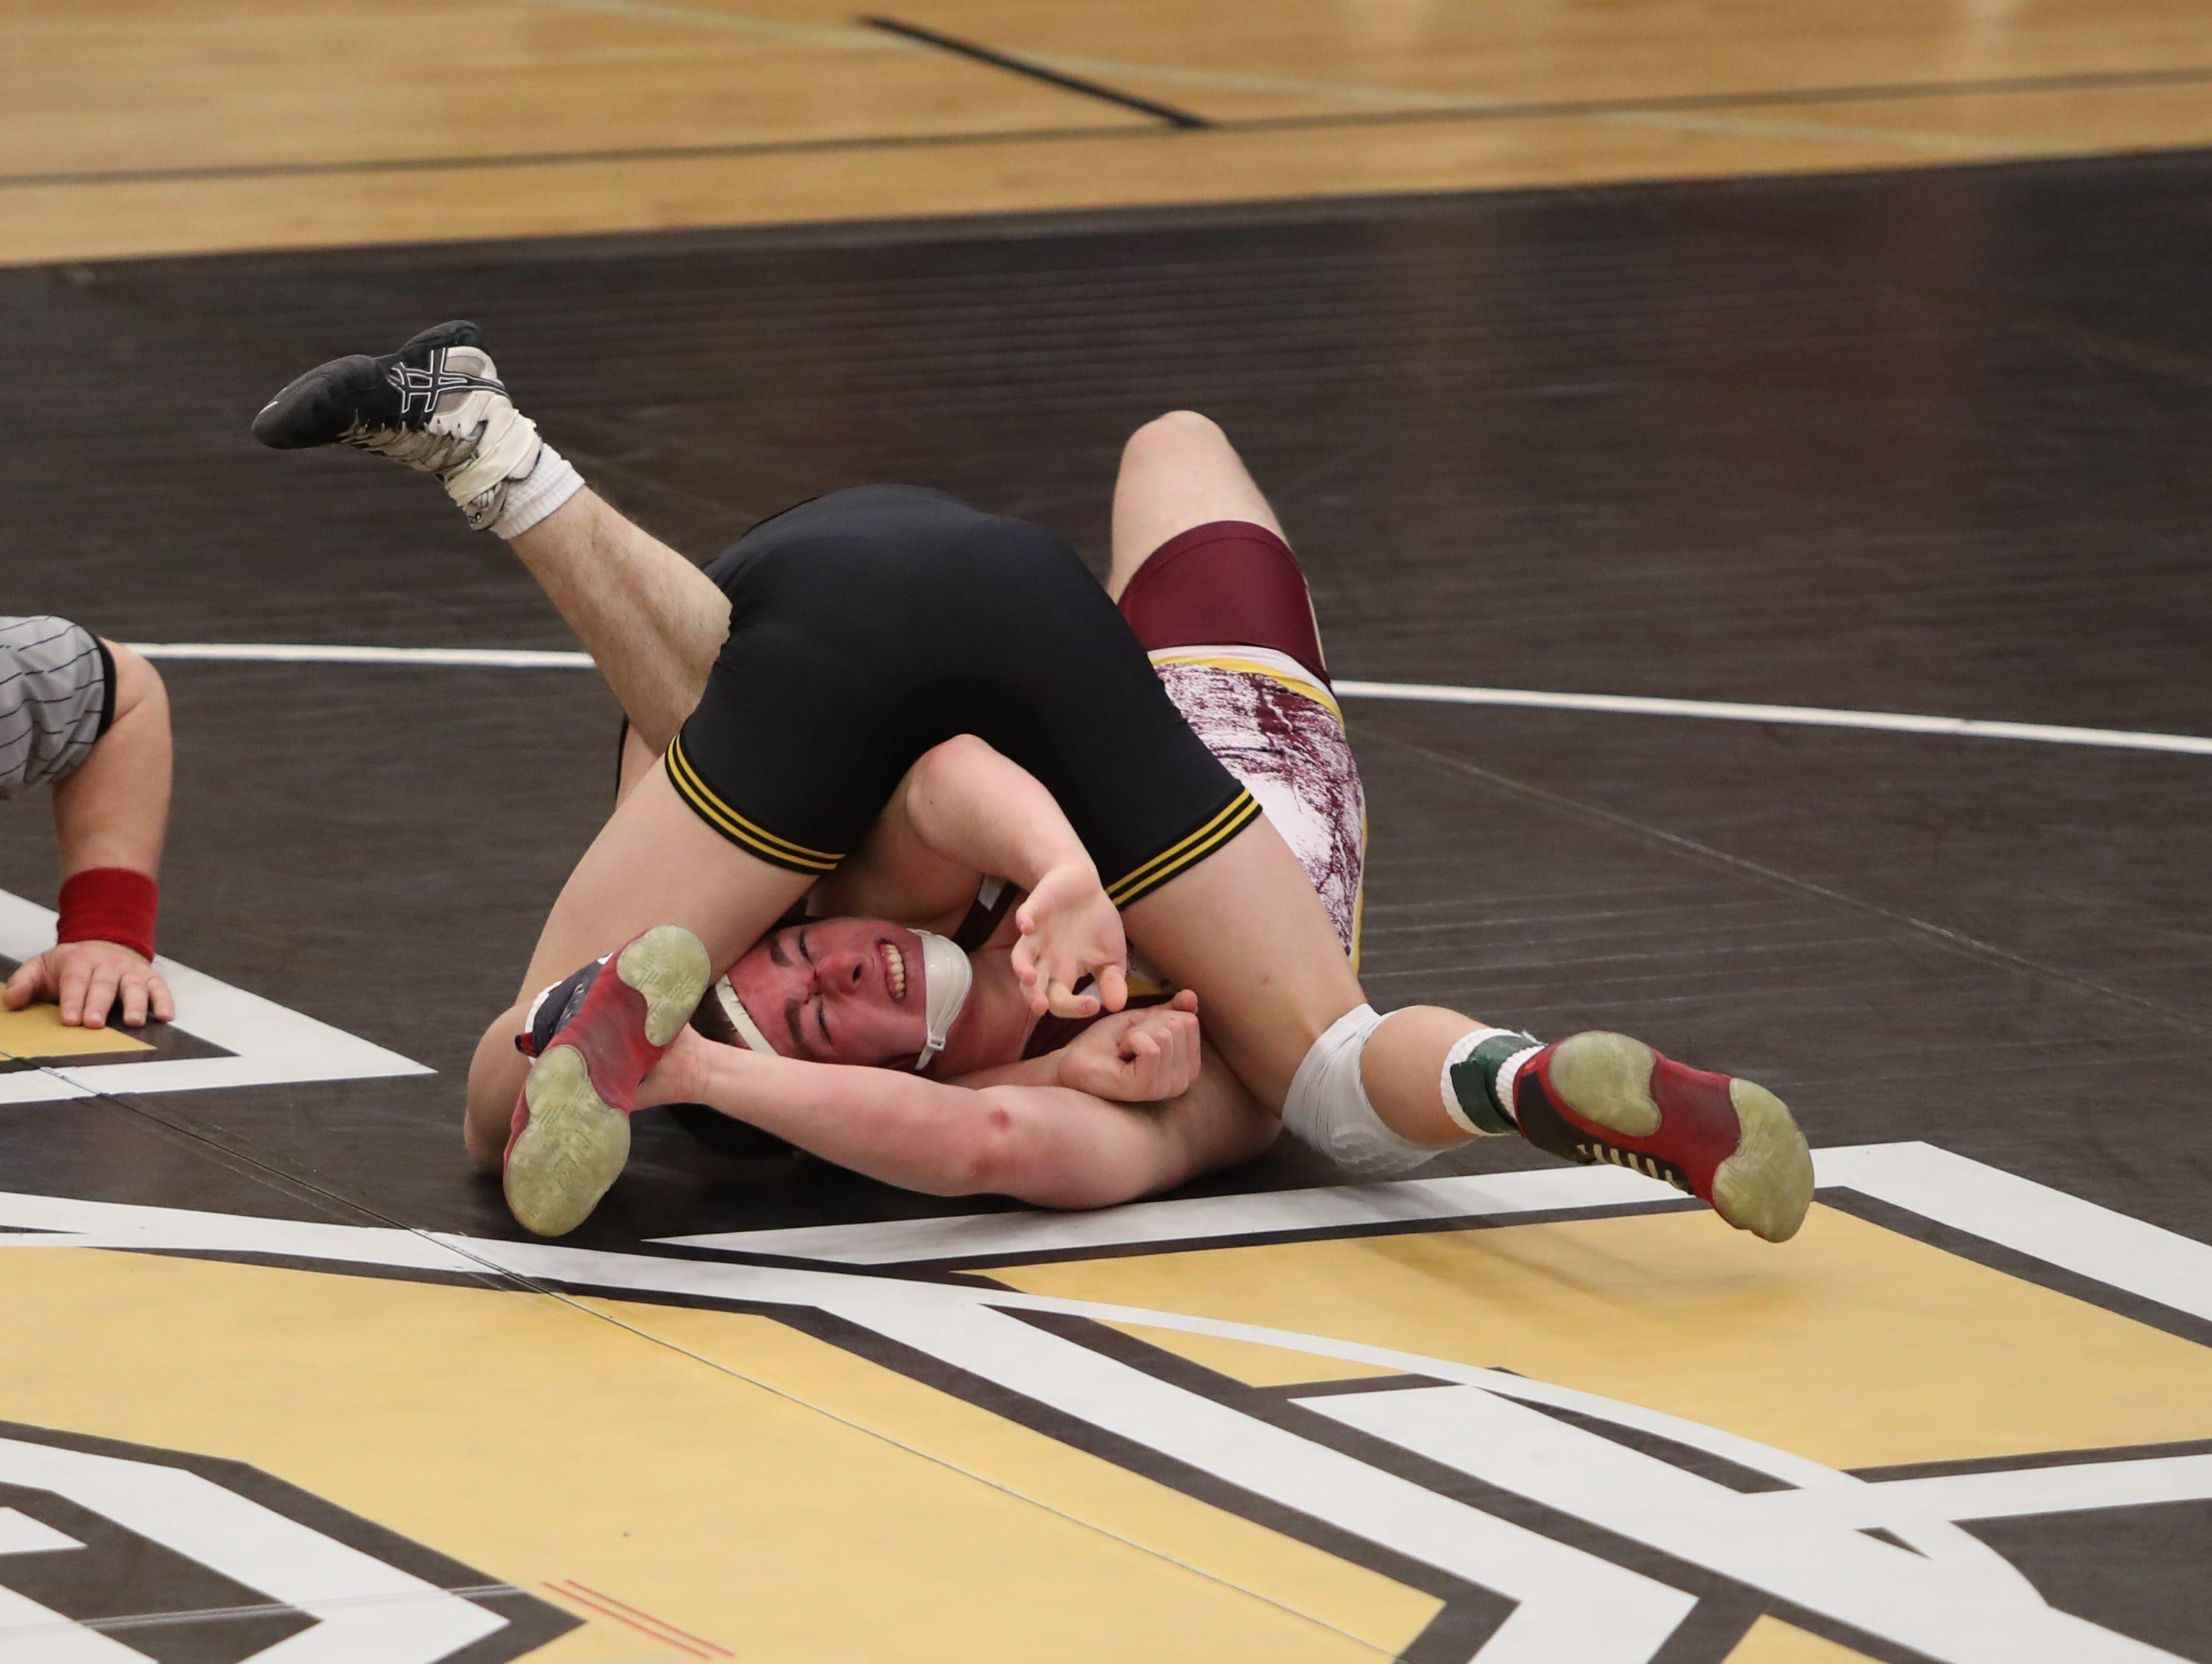 Southeast Polk's Cade DeVos pins Ankeny's Mo Watson in a 160-pound match in 1:36. Southeast Polk defeated Ankeny 57-17 in a regional dual Feb. 6 at Southeast Polk.